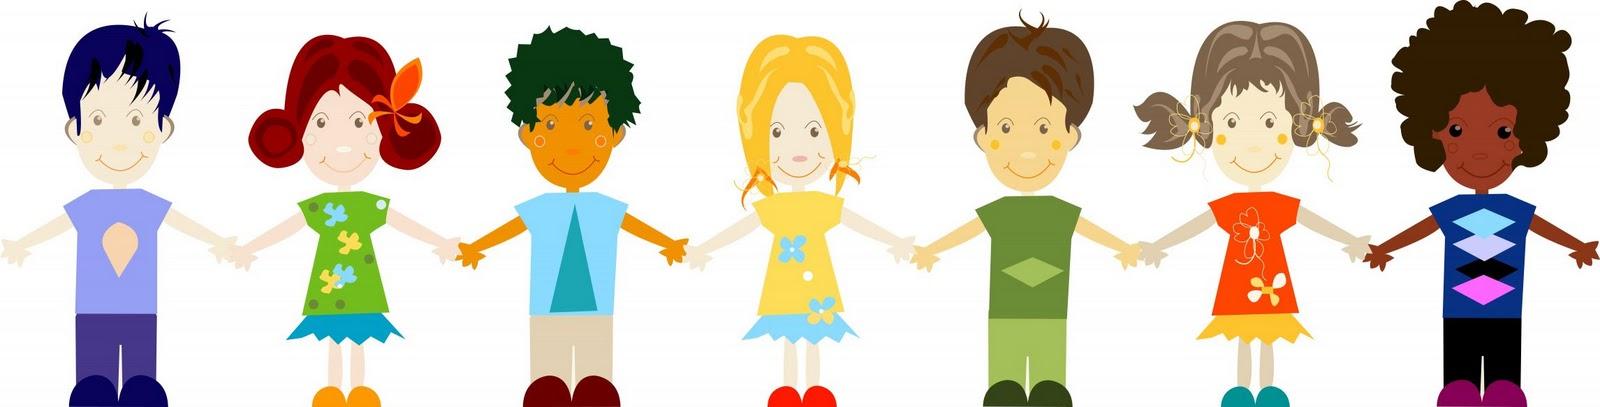 Culture clipart school diversity Cliparts  Diversity Download Clip